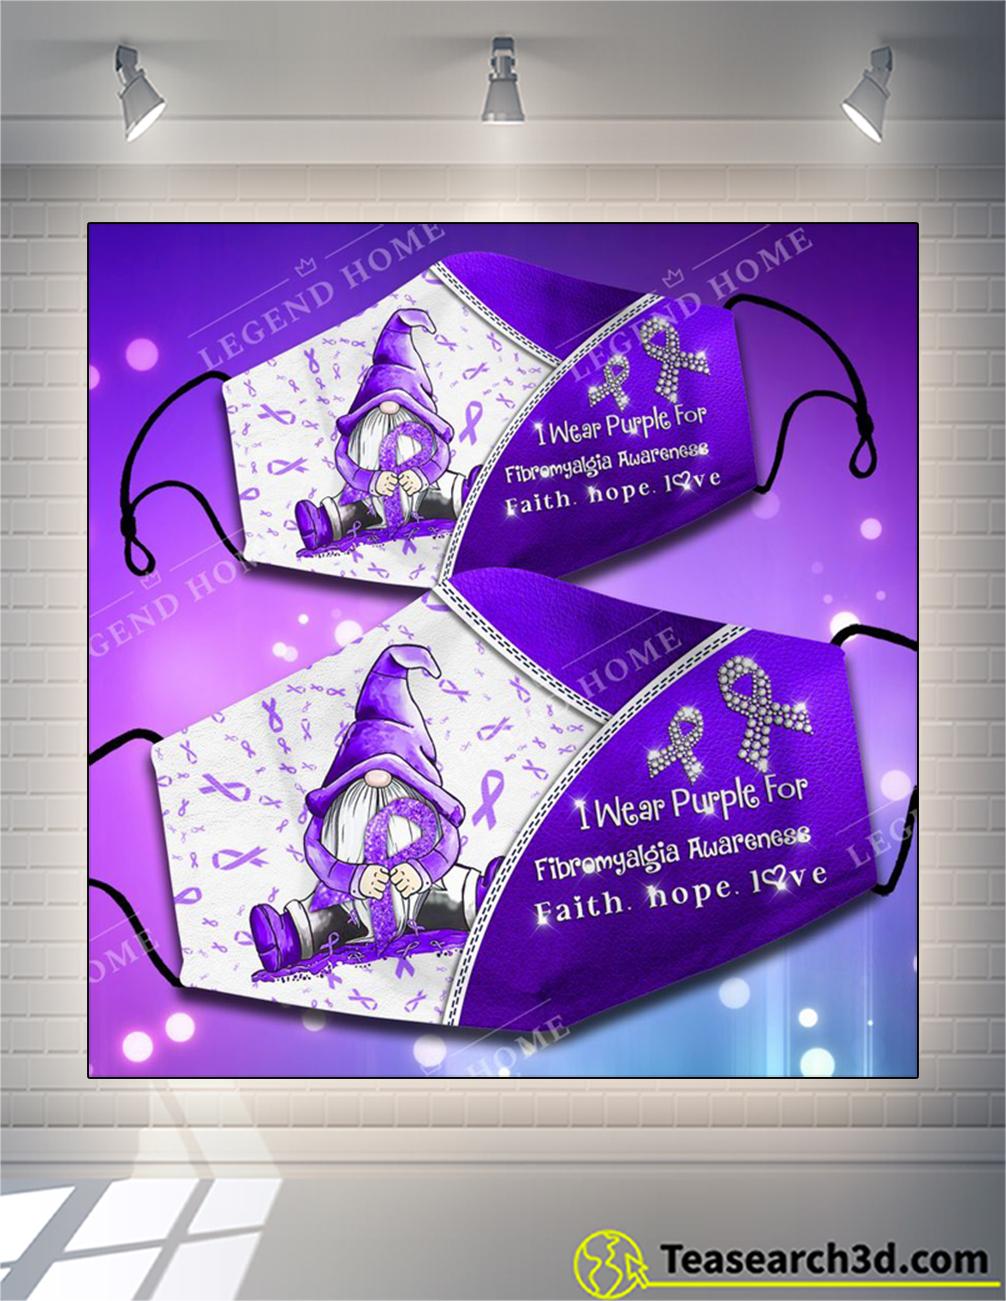 I wear purple for fibromyalgia awareness face mask